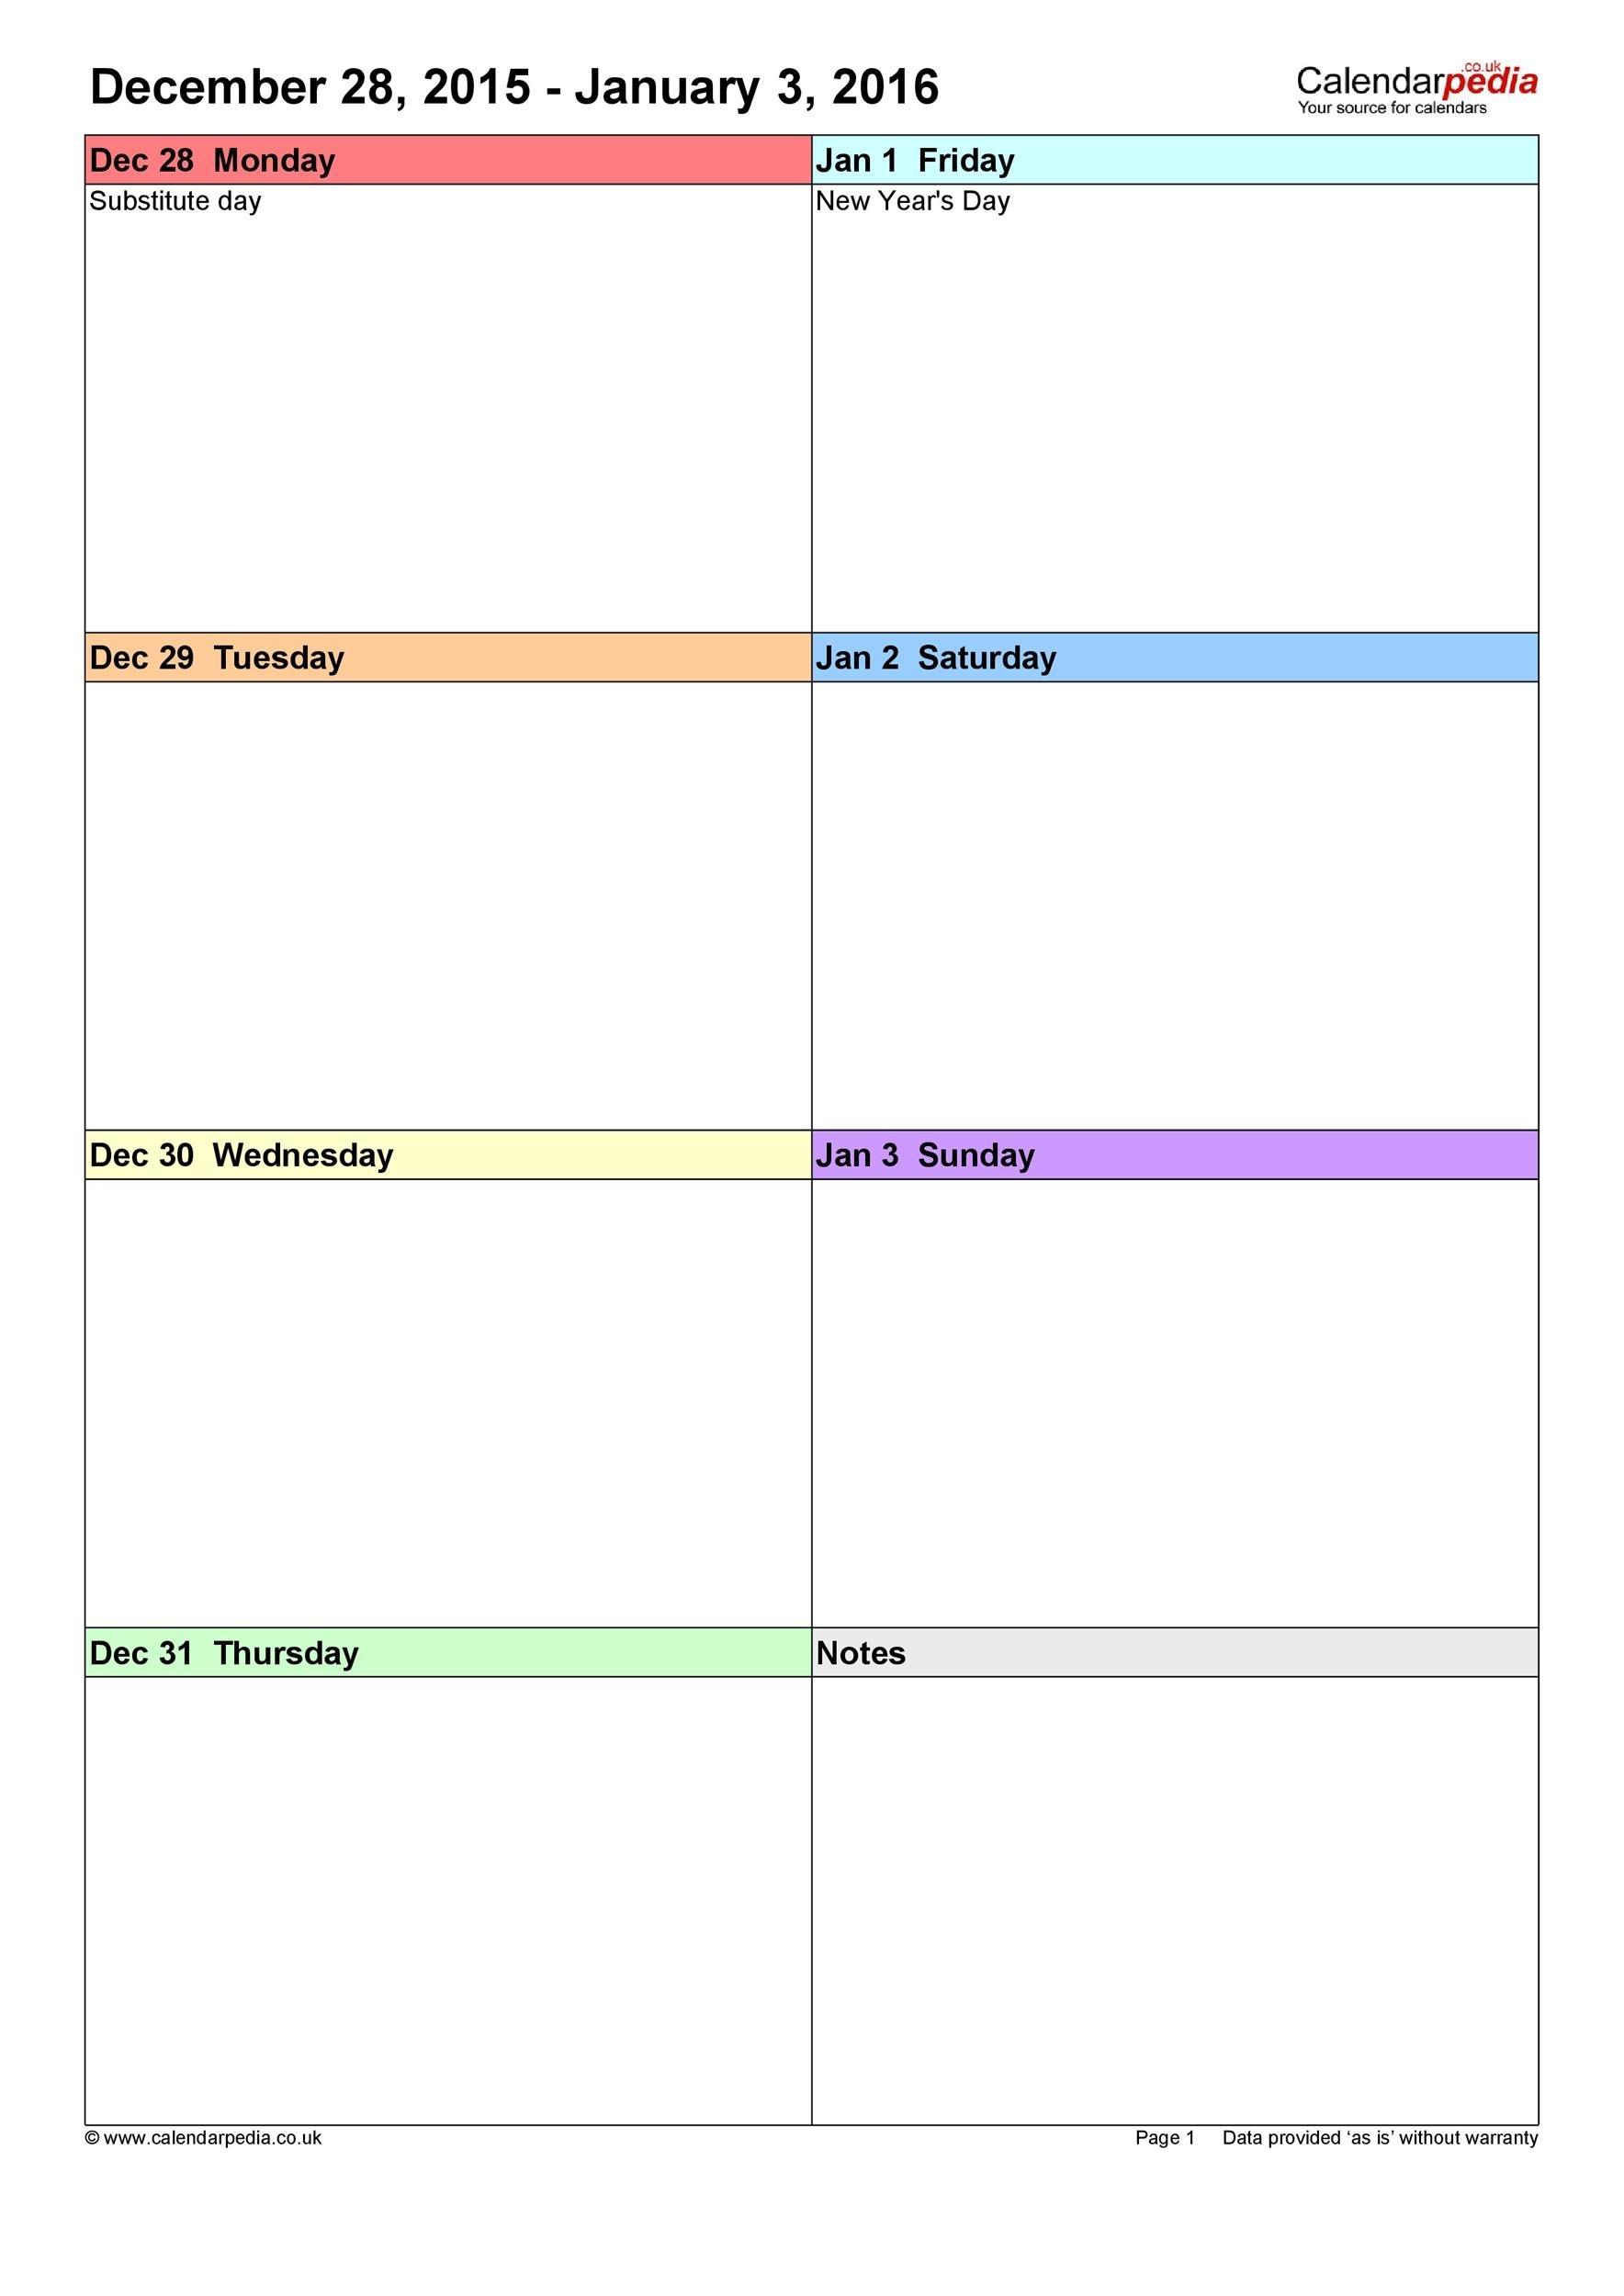 Get 7 Day Calendar Printable